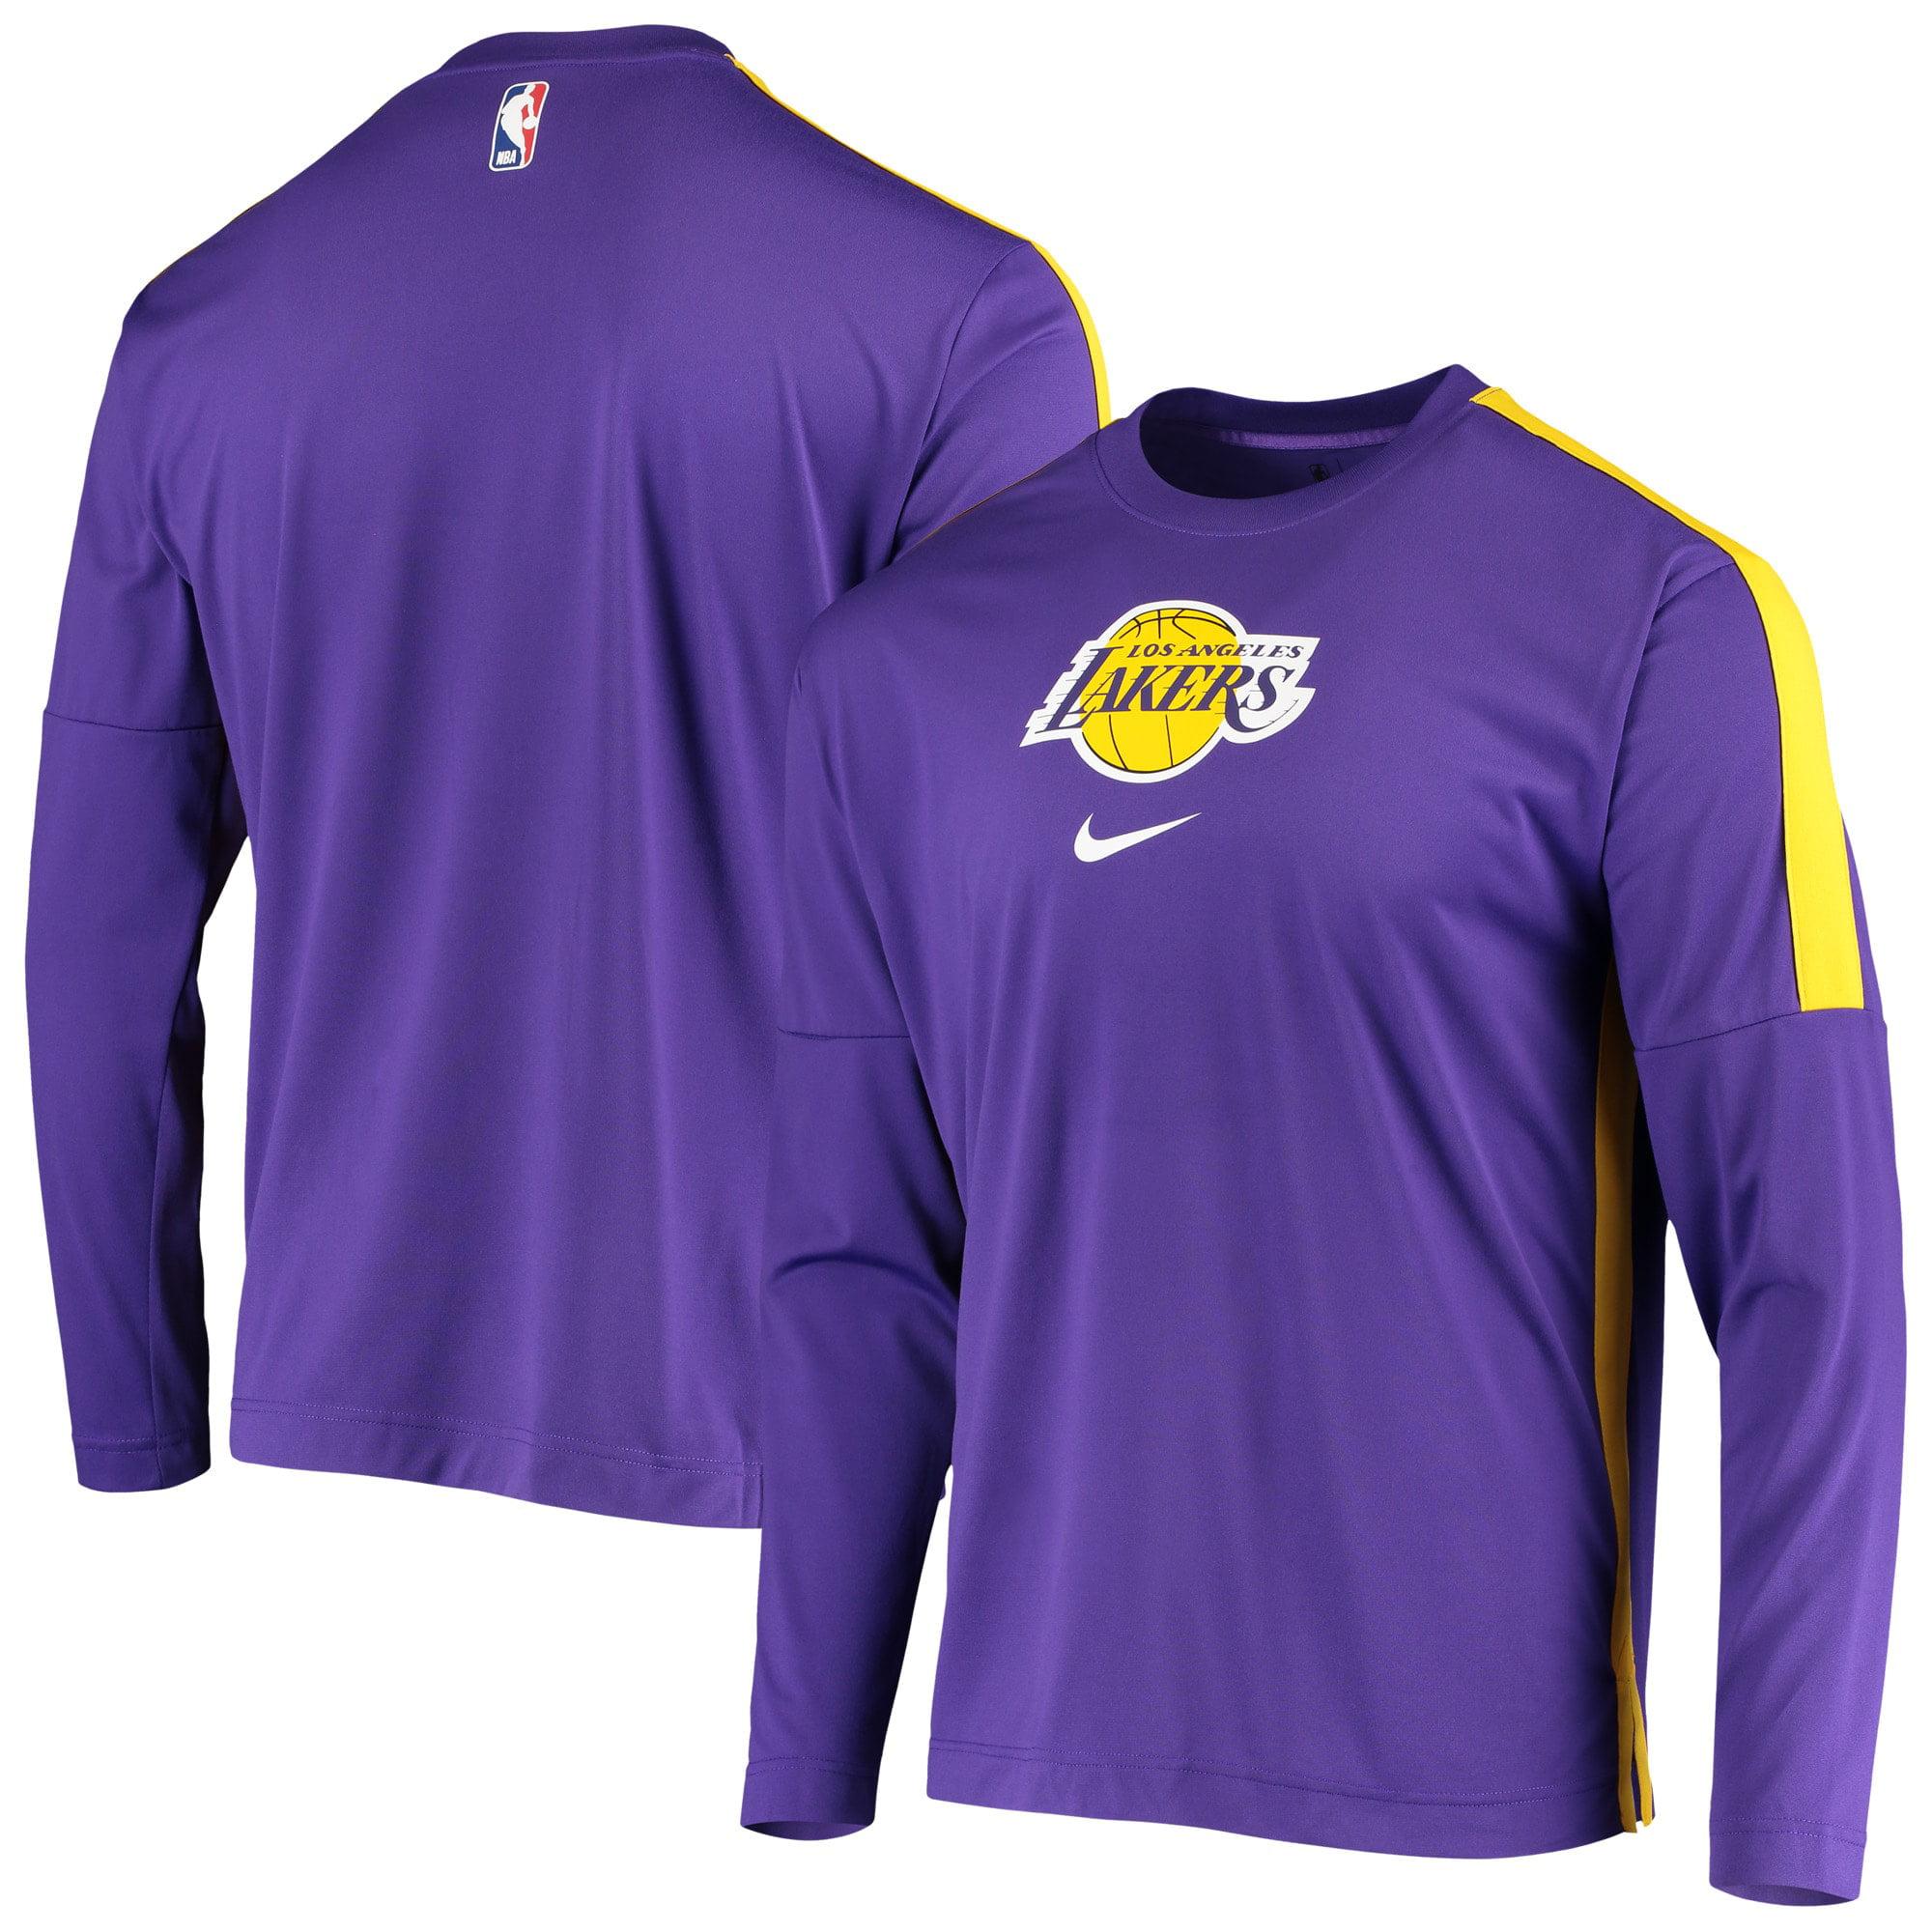 Los Angeles Lakers Nike Long Sleeve Shooting Performance Shirt - Purple